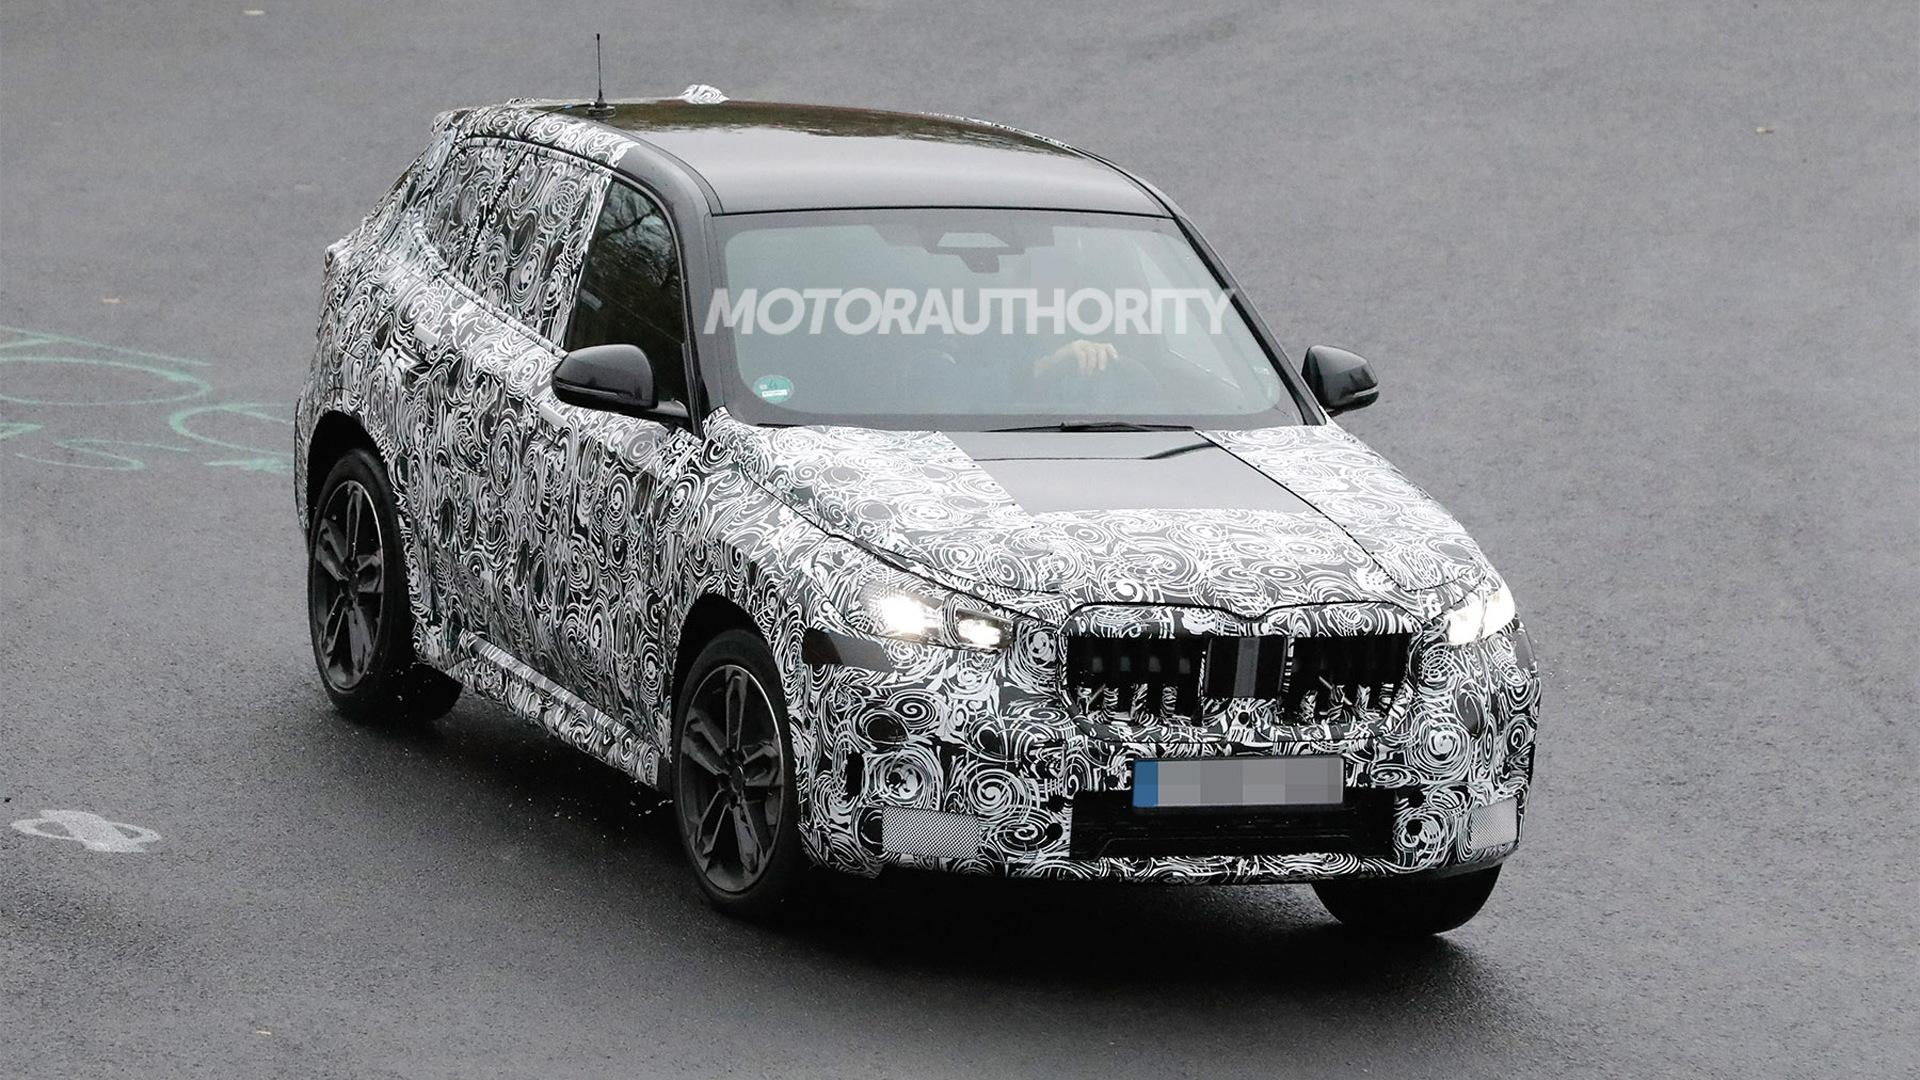 2023 BMW X1 M35i spy shots - Photo credit:S. Baldauf/SB-Medien